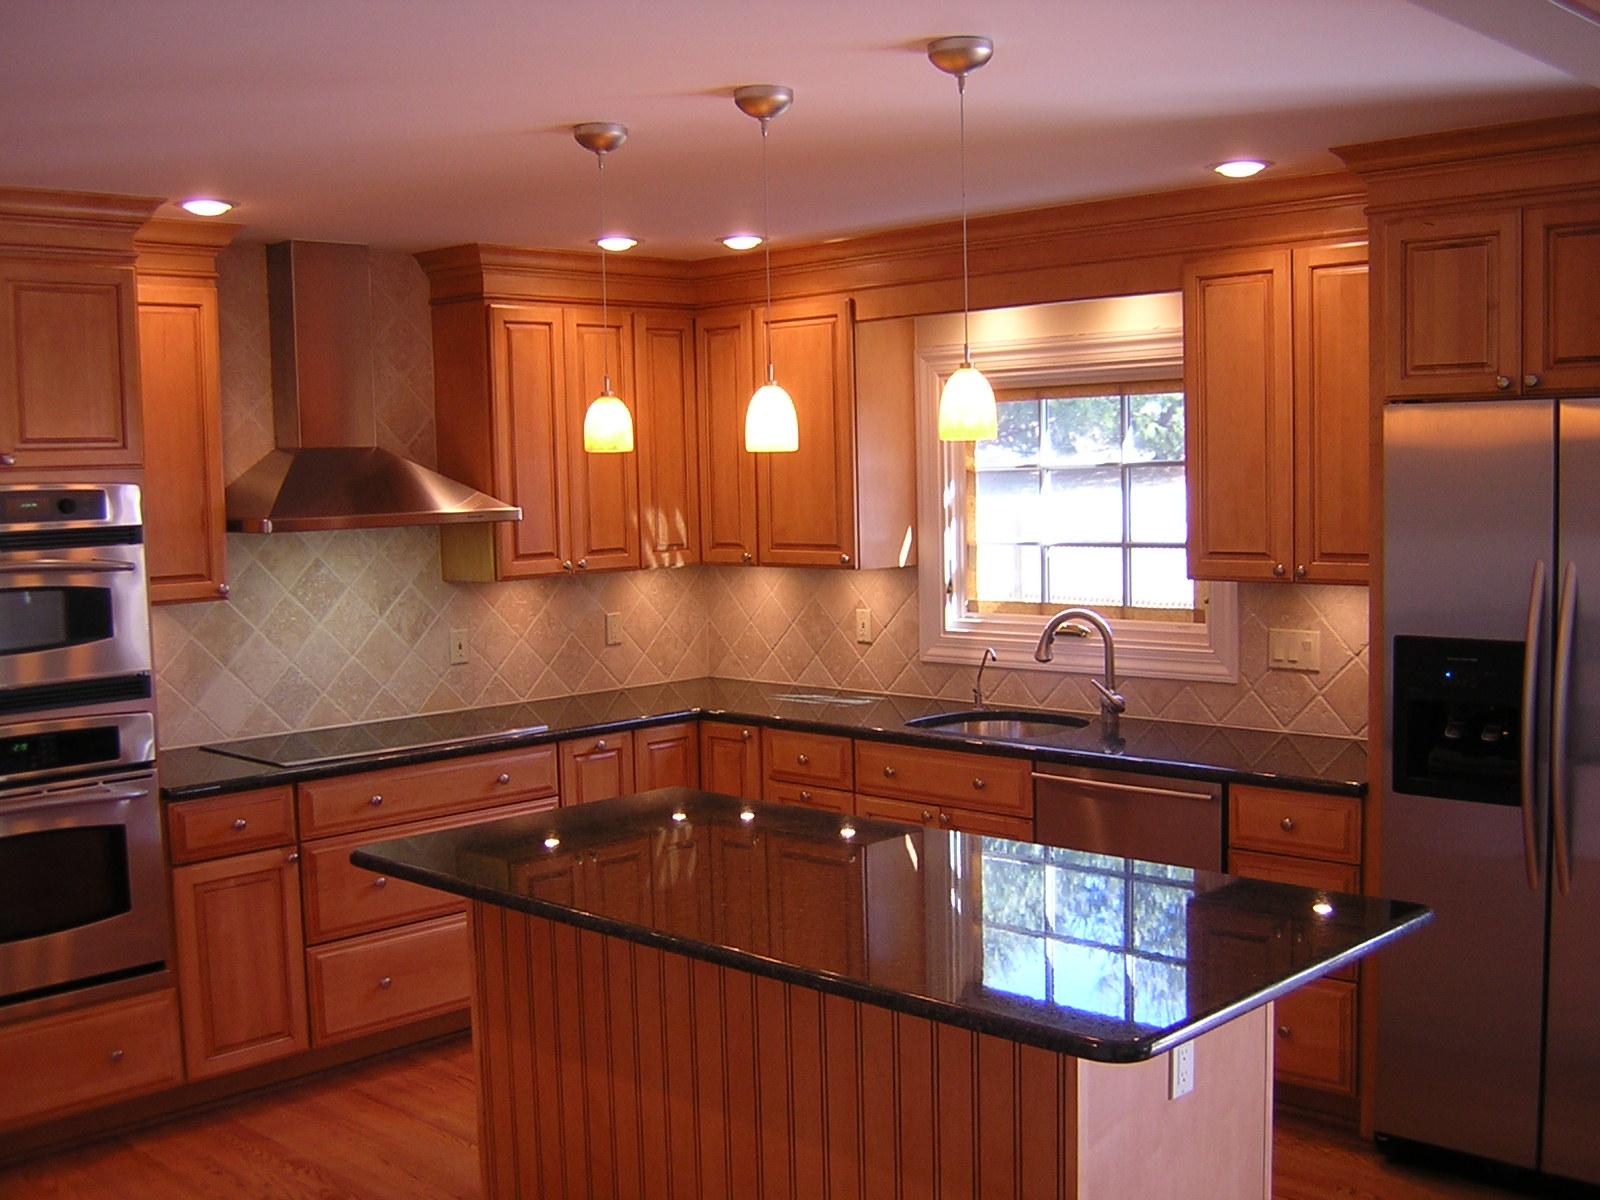 granite kitchen designs pictures photo - 1